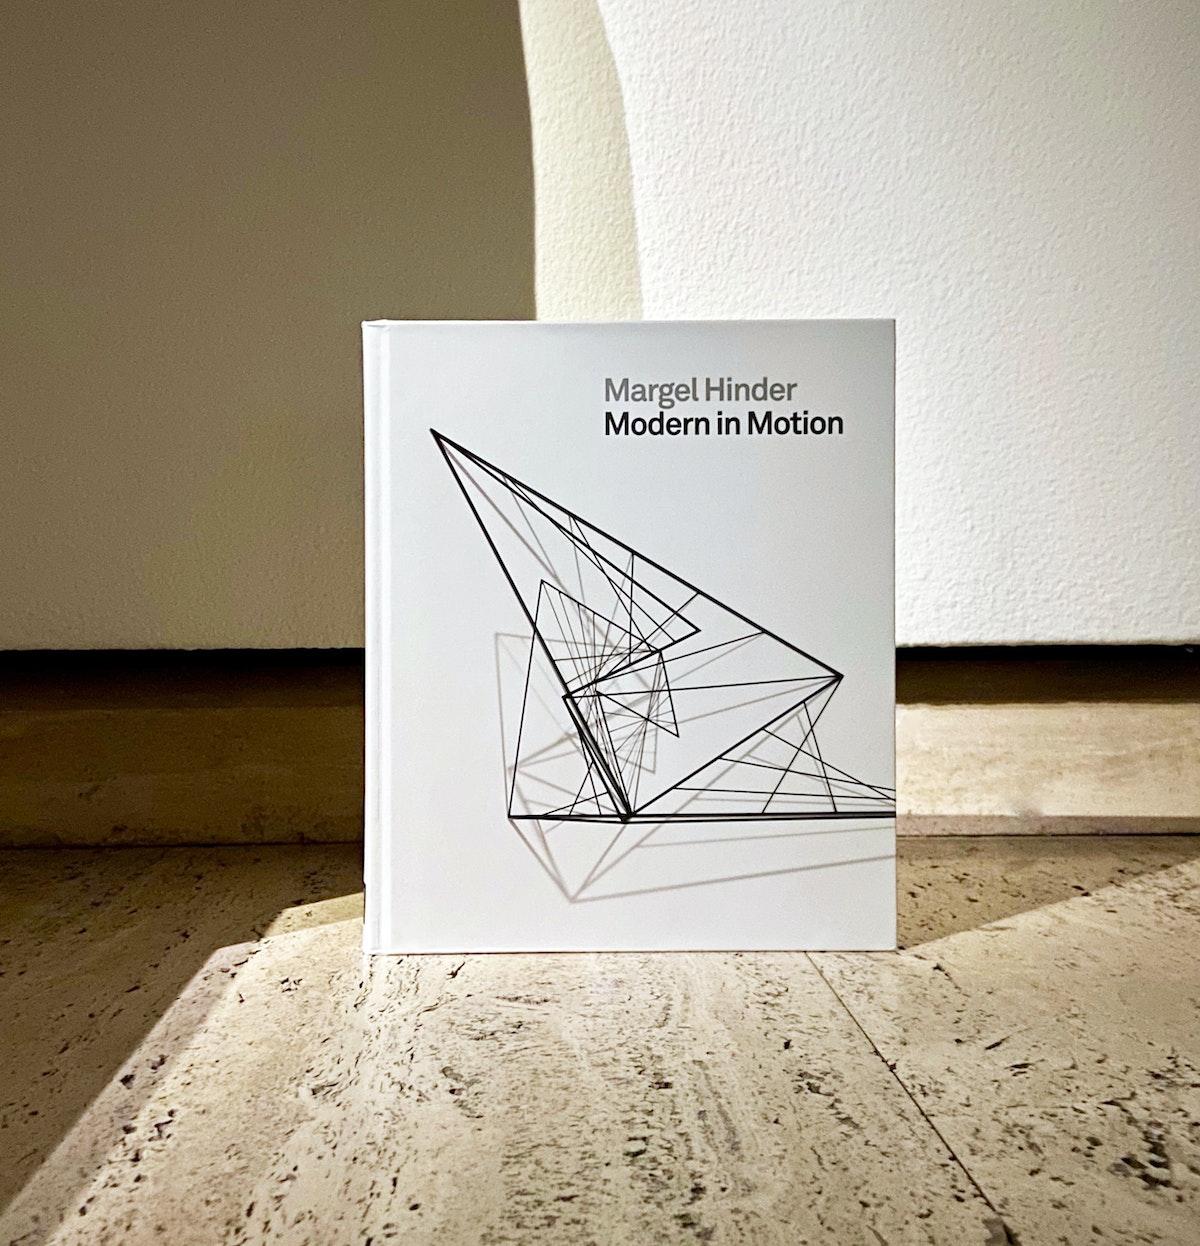 Margel Hinder: Modern in Motion, book